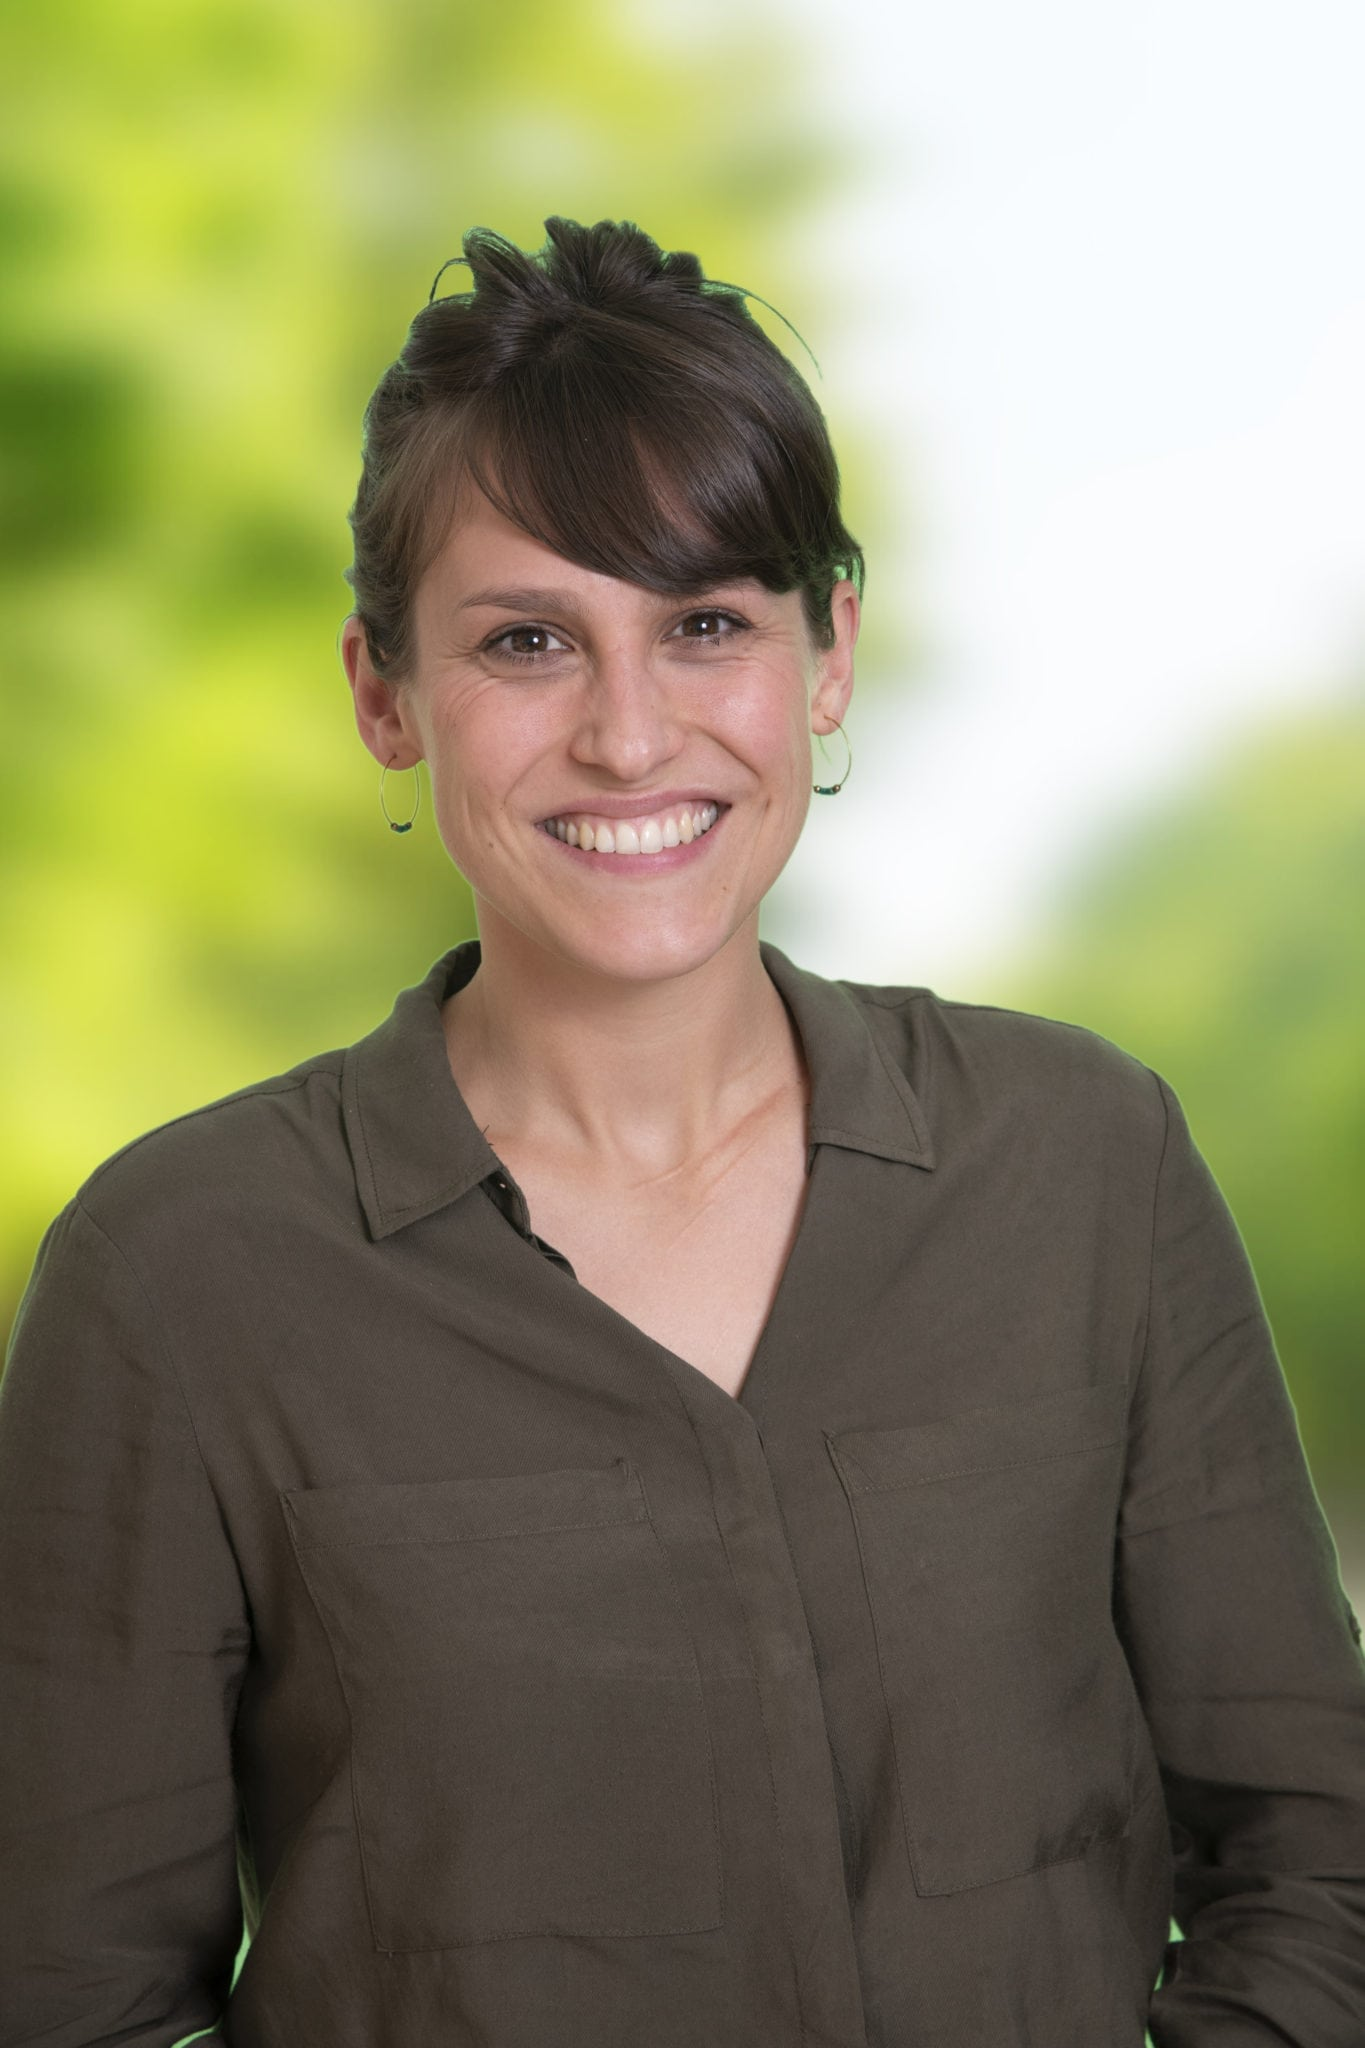 Justine Vranken